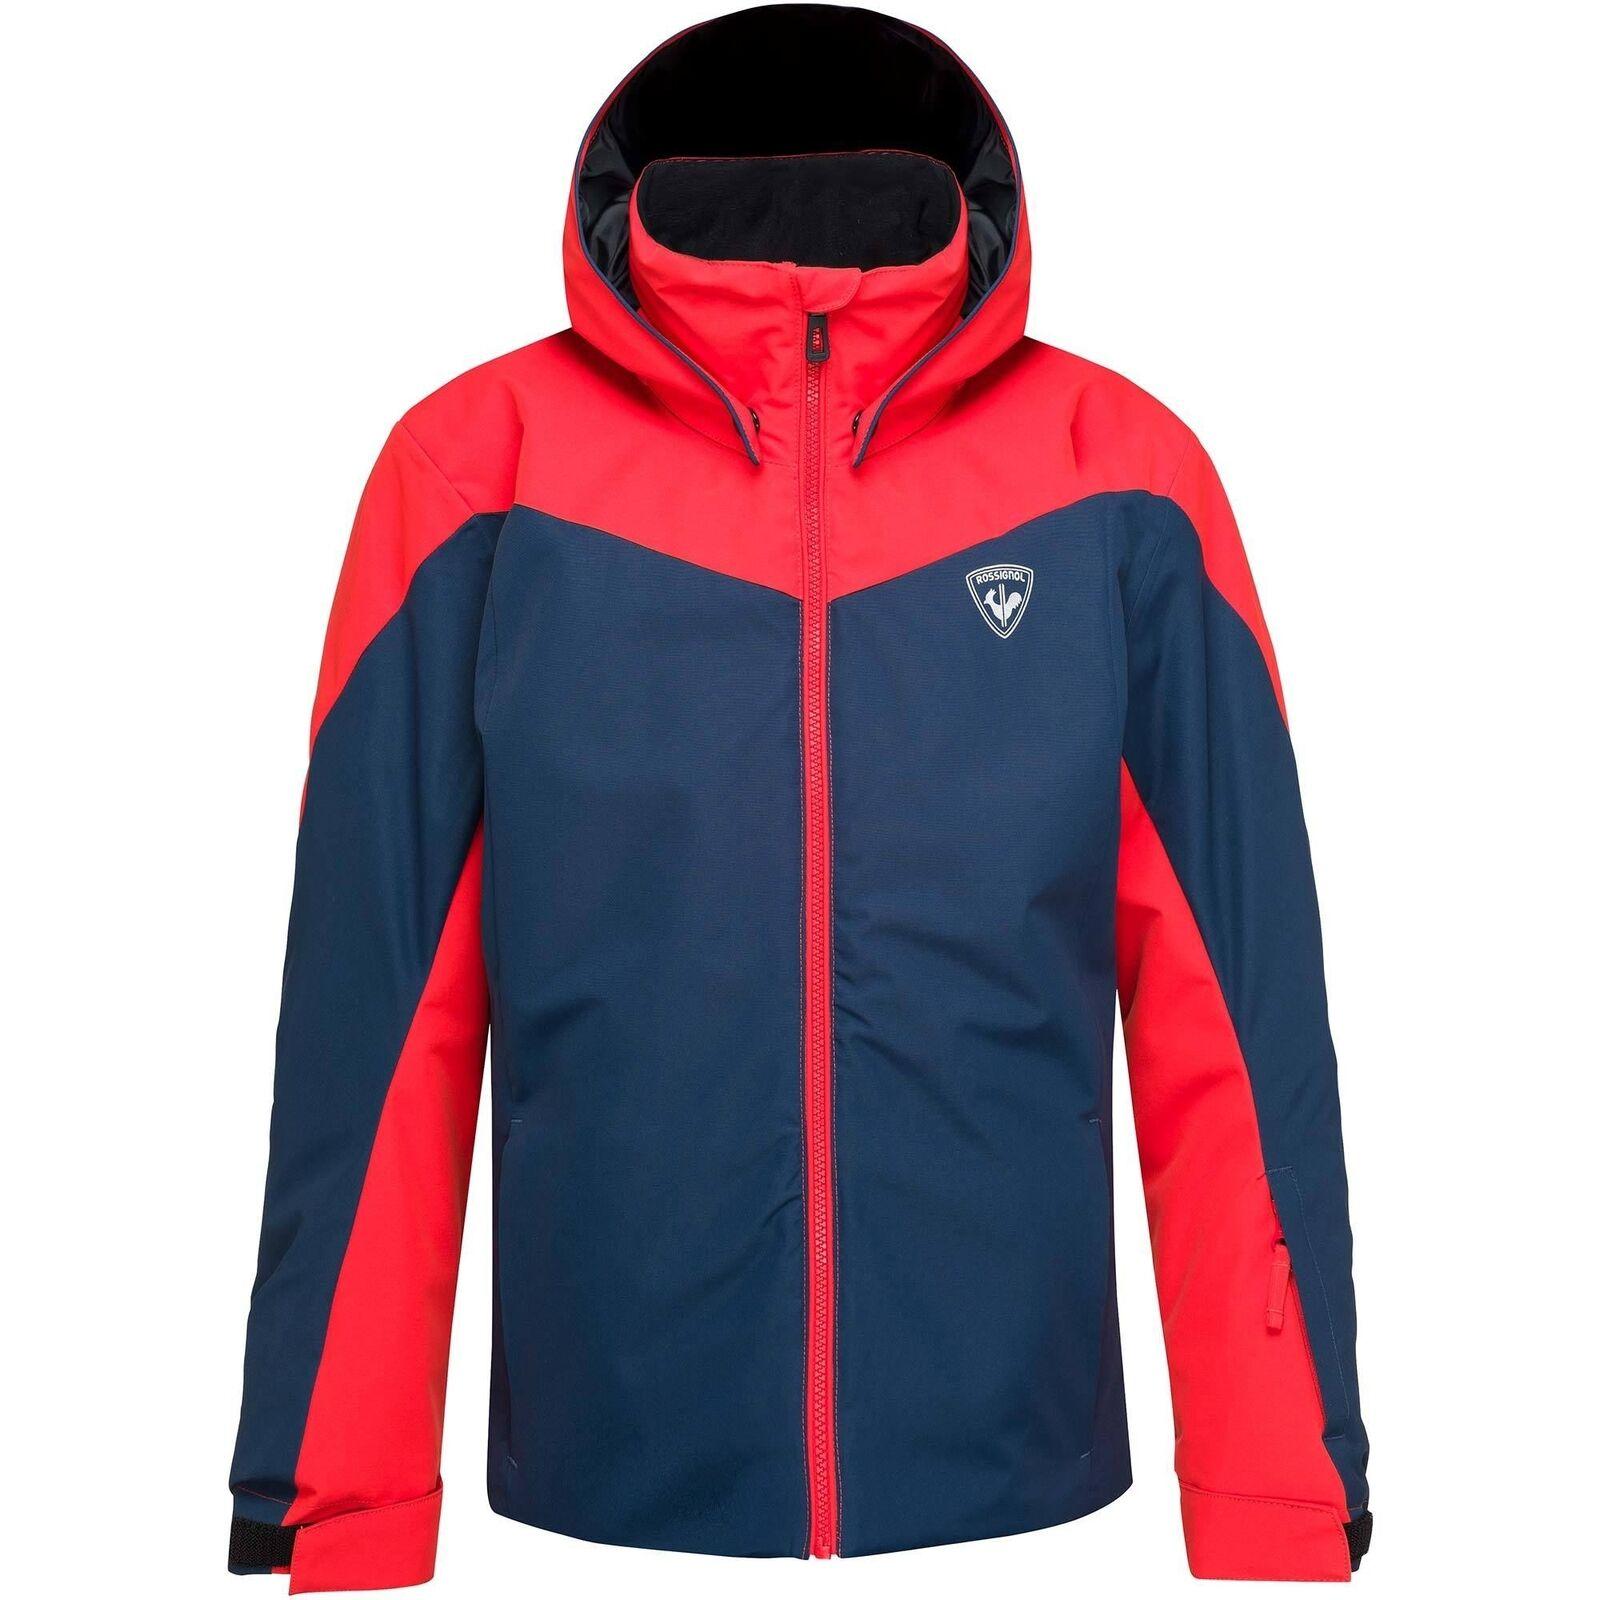 Rossignol giacca da neve Fonction, junior - Art. RLIYJ14-304 (Crimson)